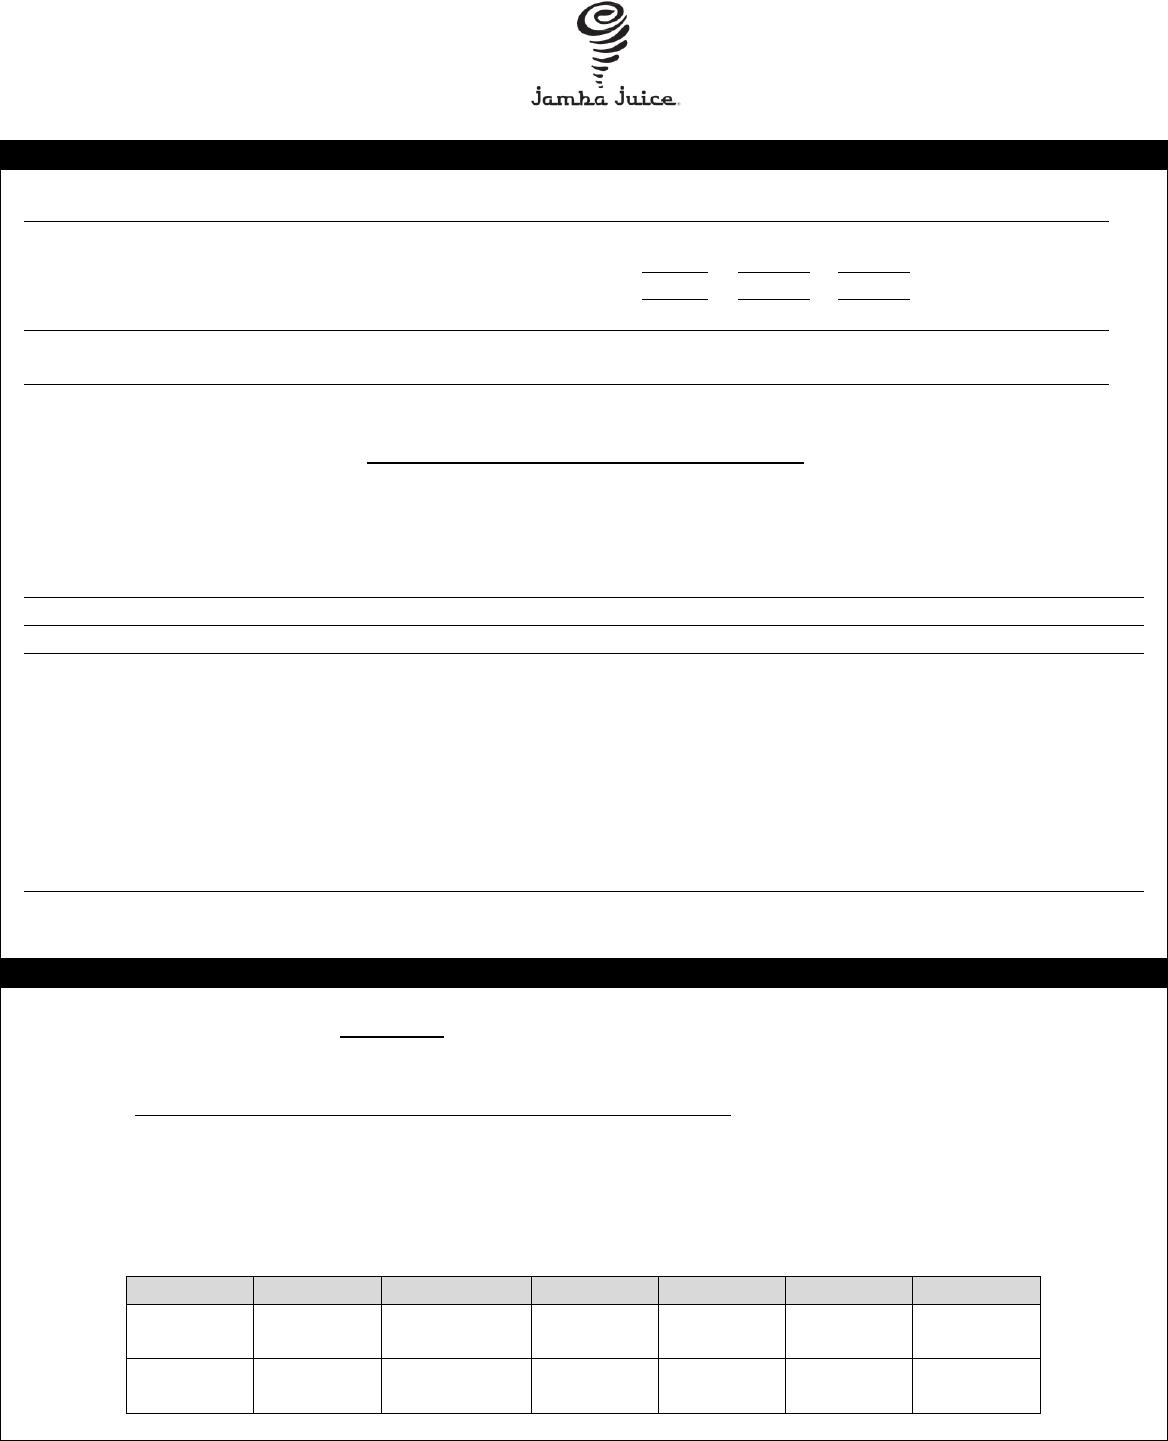 Free printable jamba juice job application form falaconquin